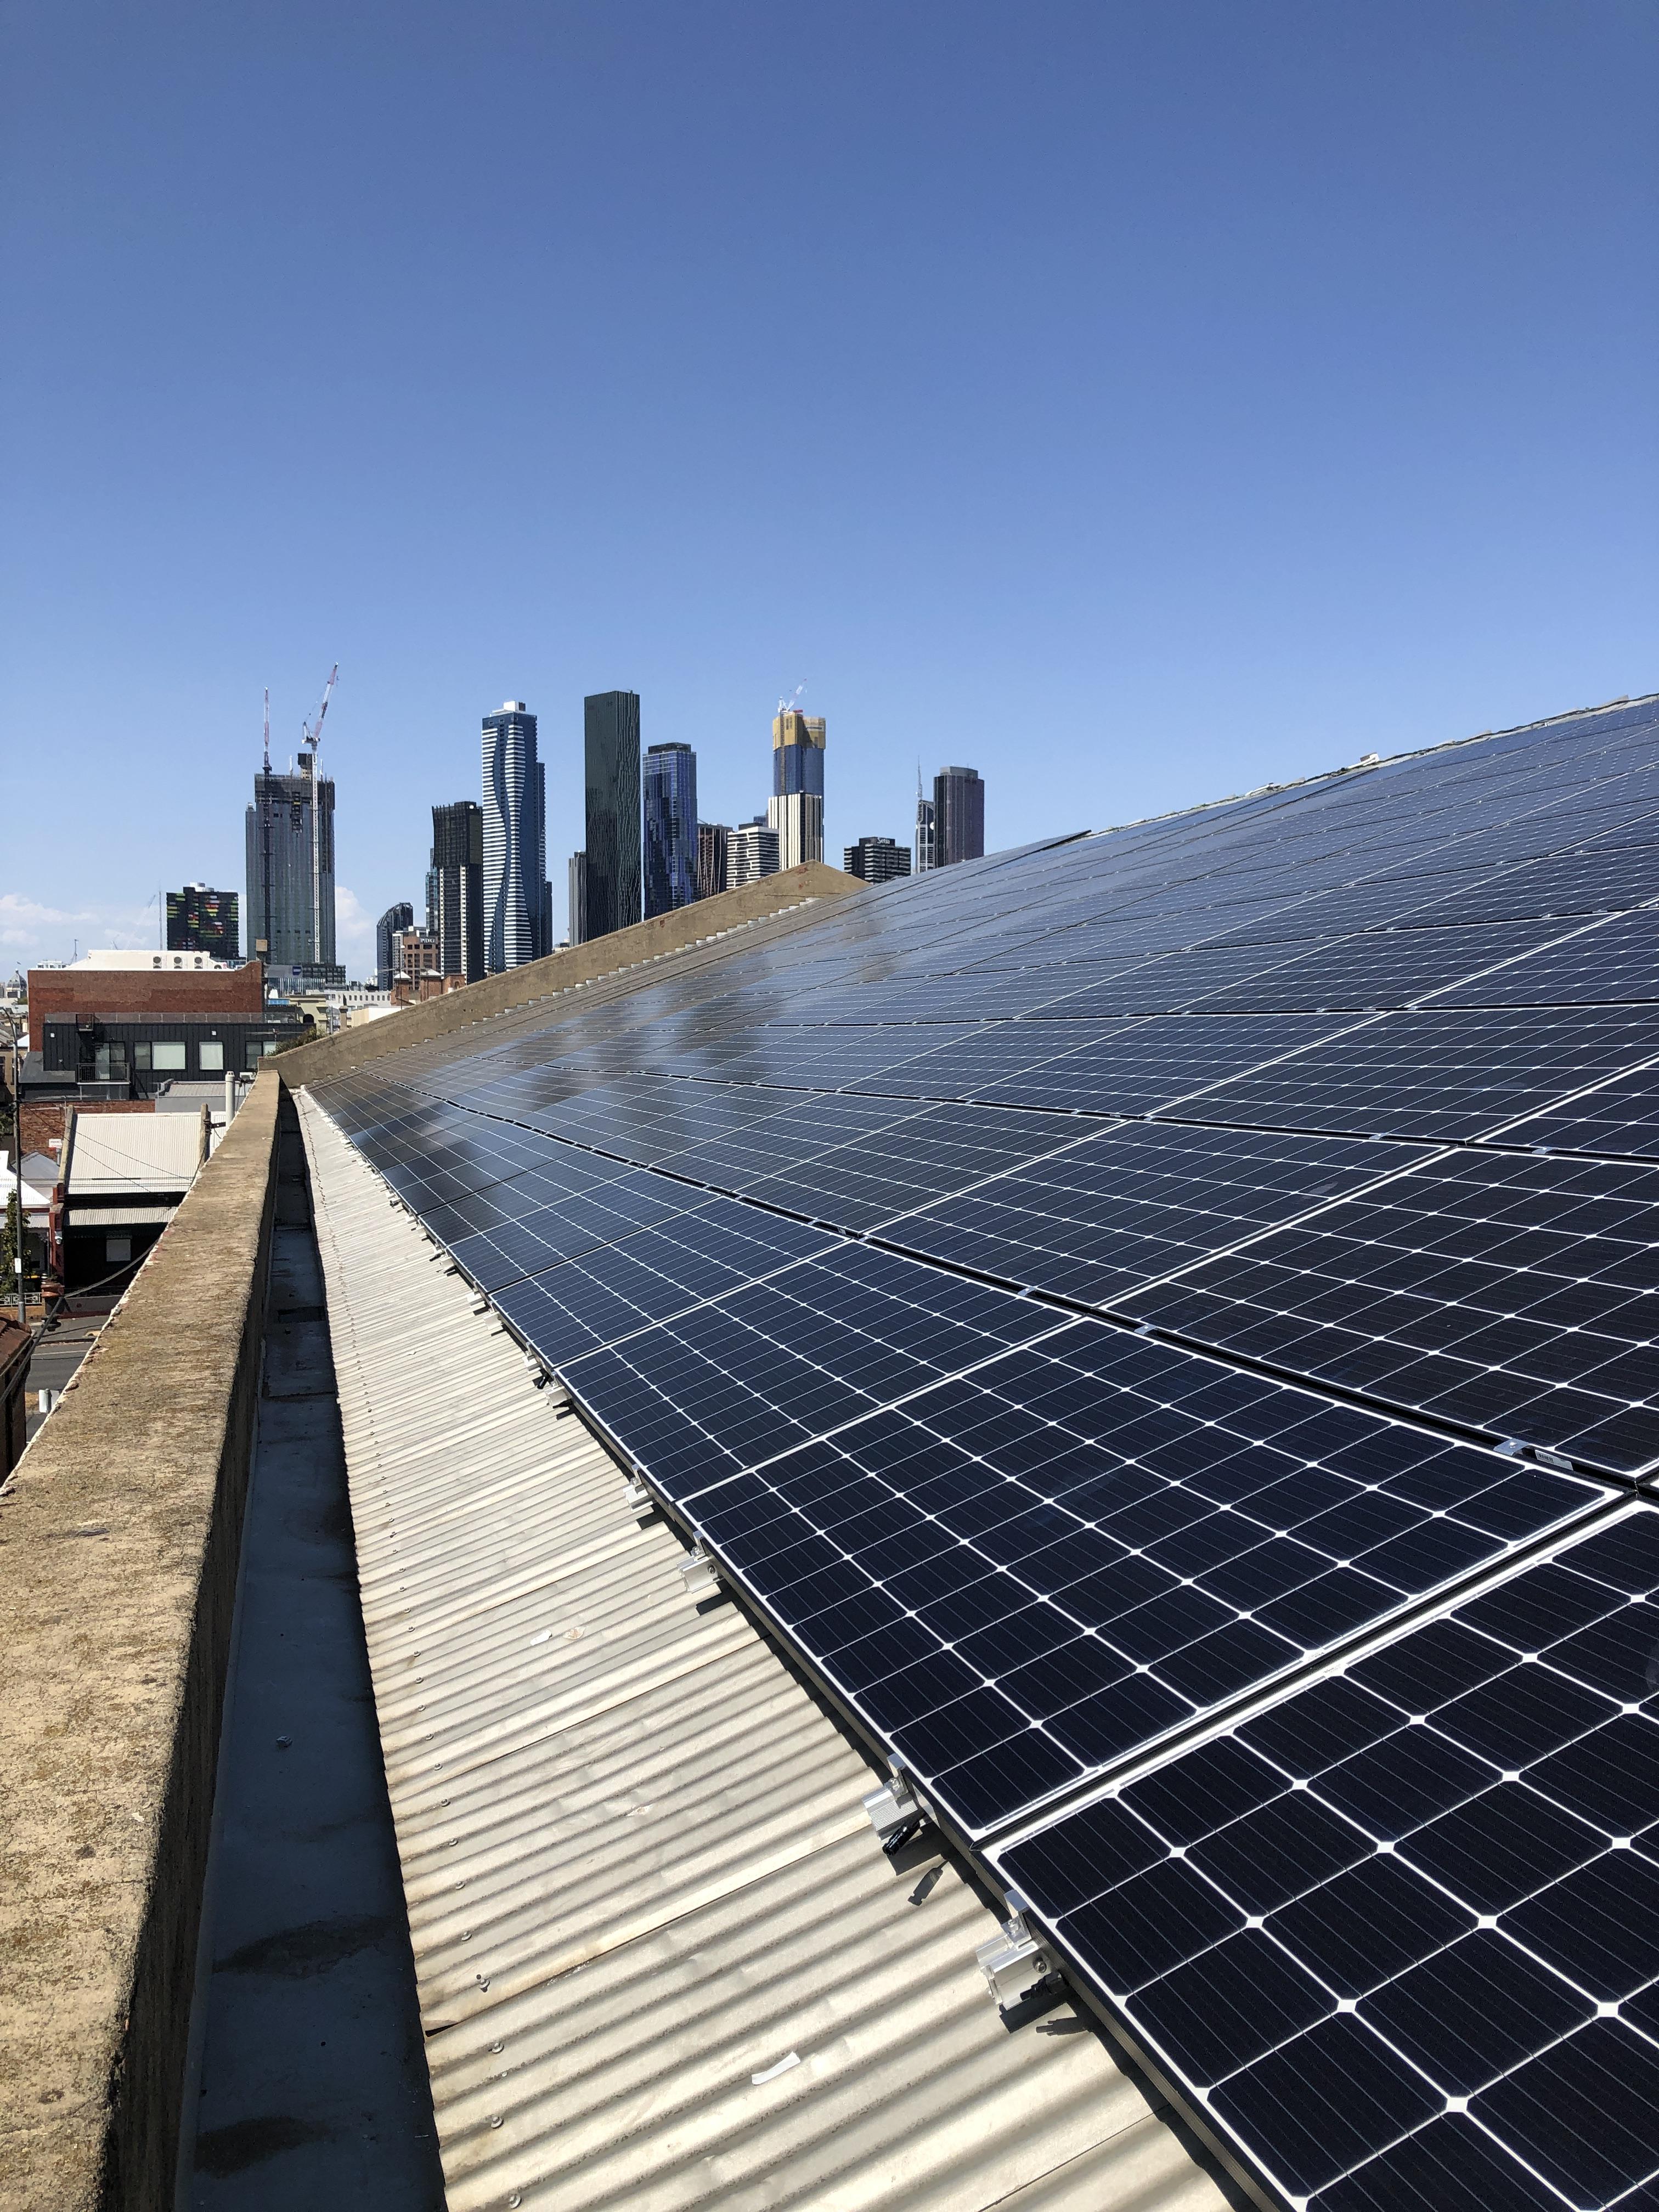 Our Community Solar